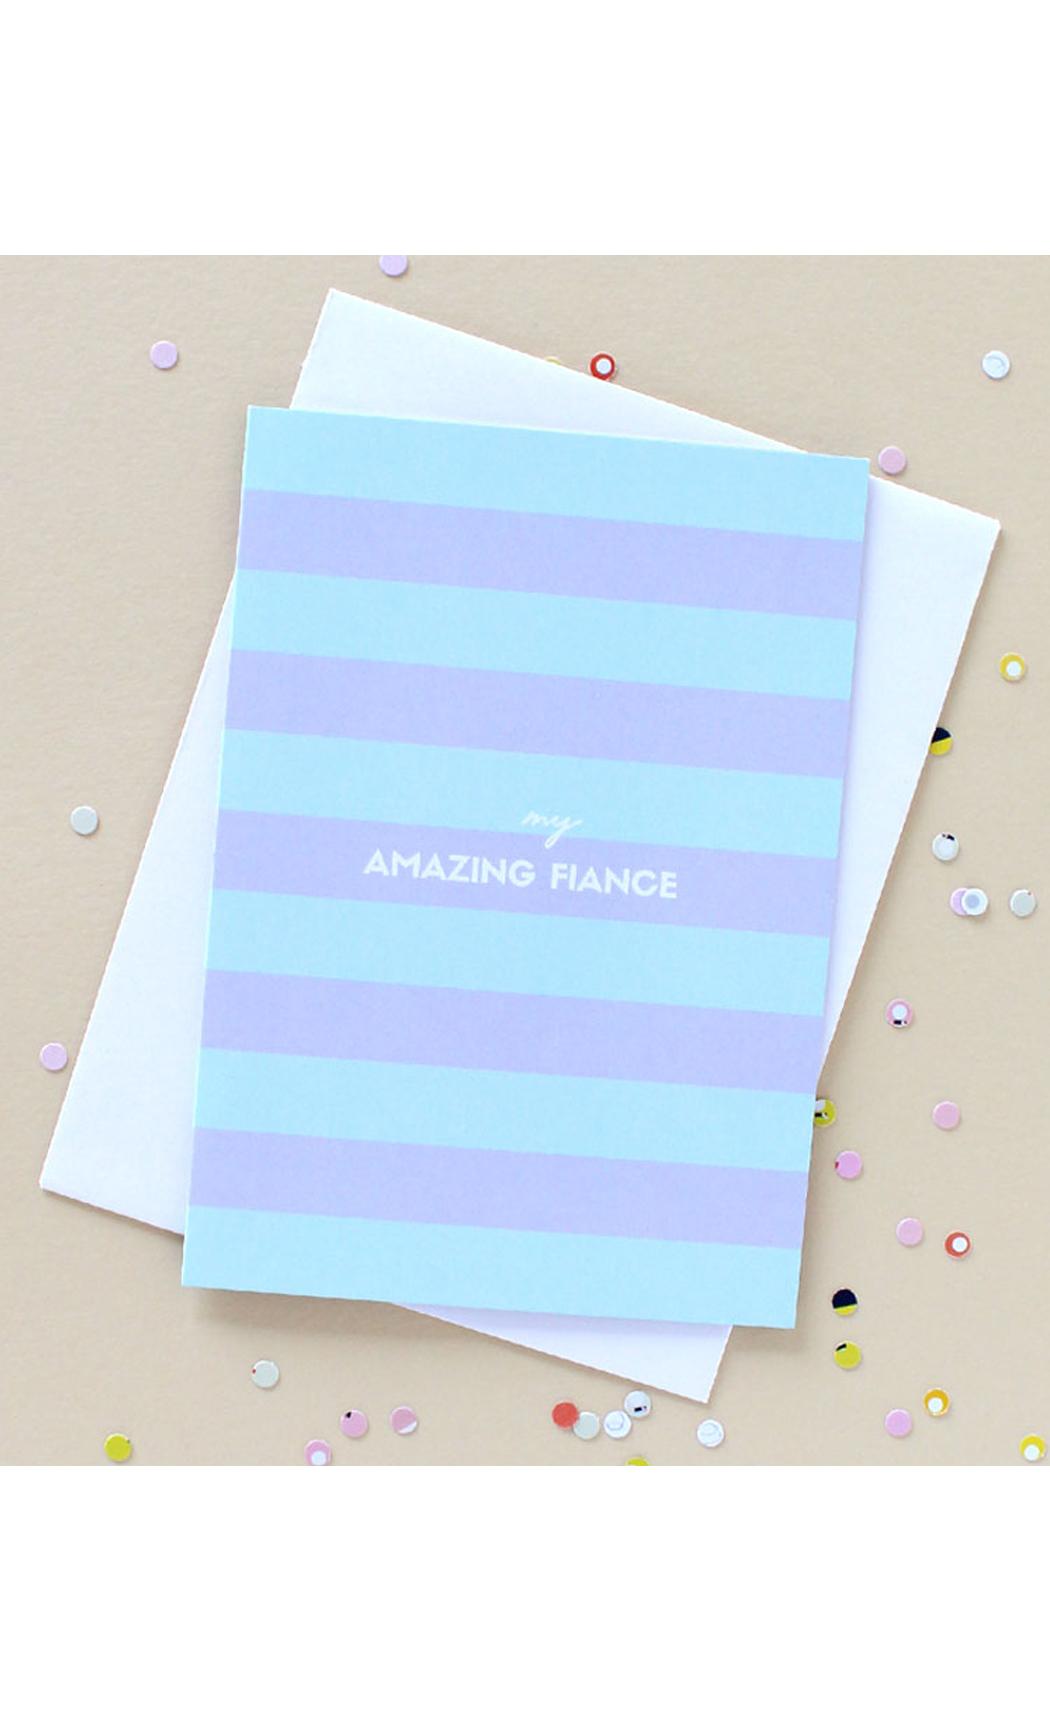 Fiance Greeting Card